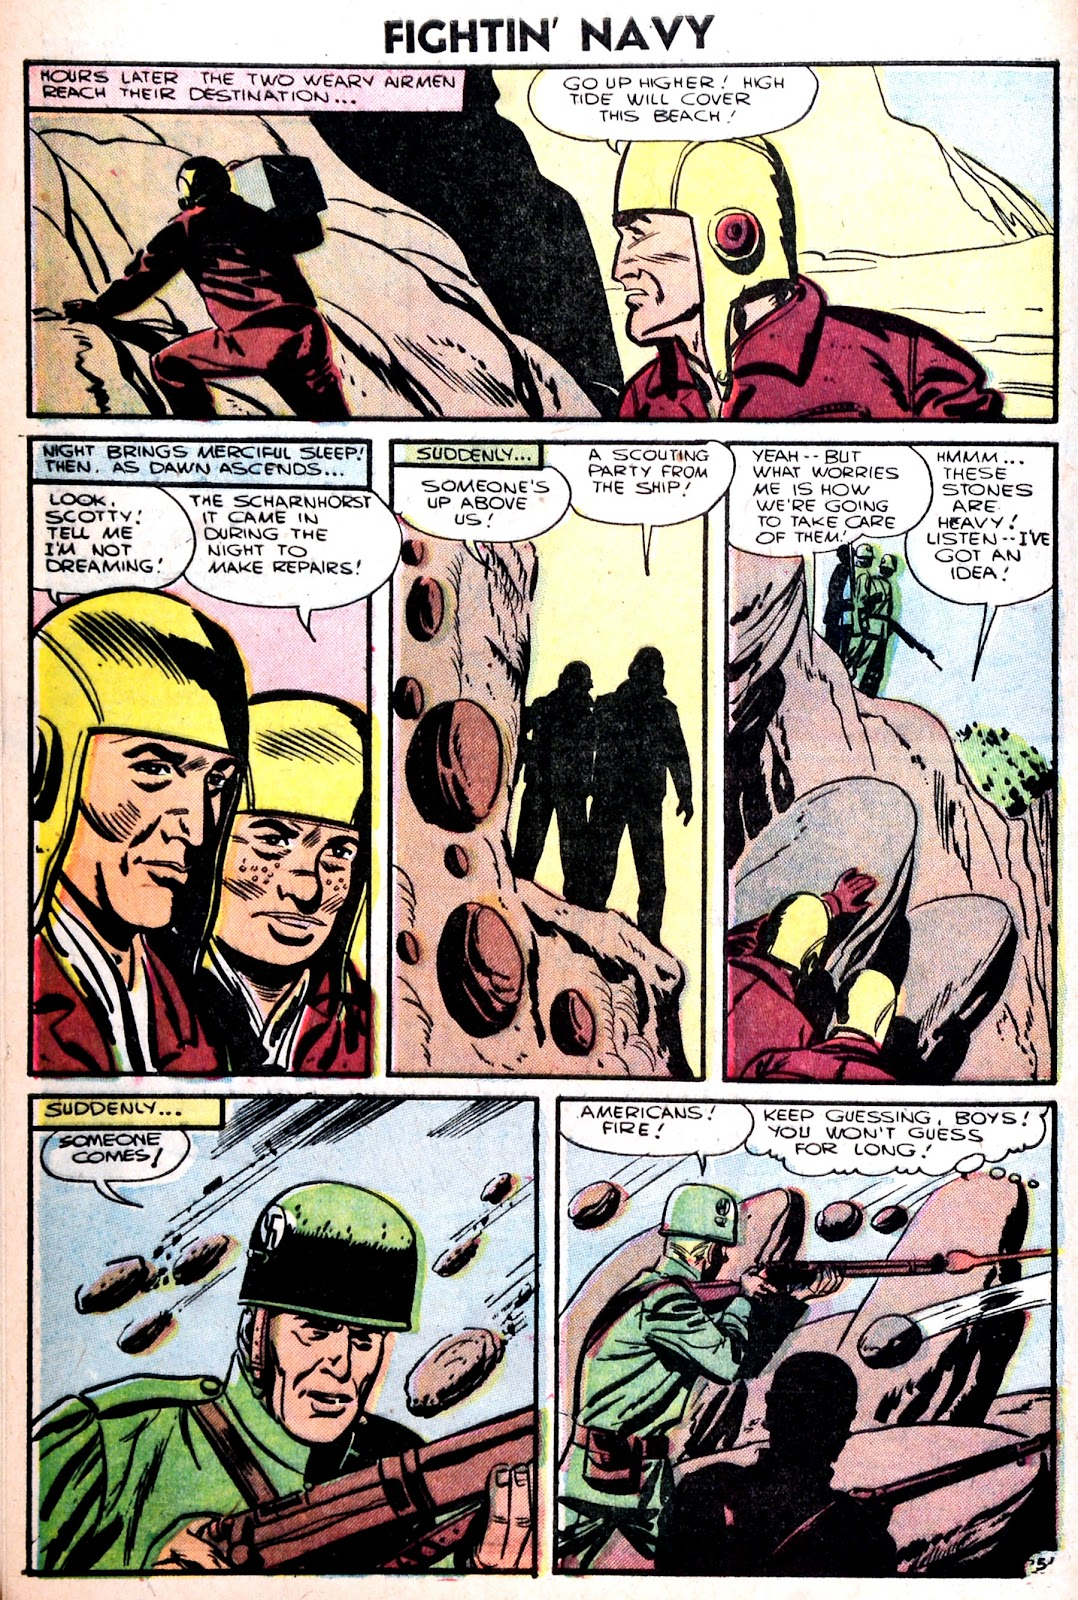 Read online Fightin' Navy comic -  Issue #75 - 8